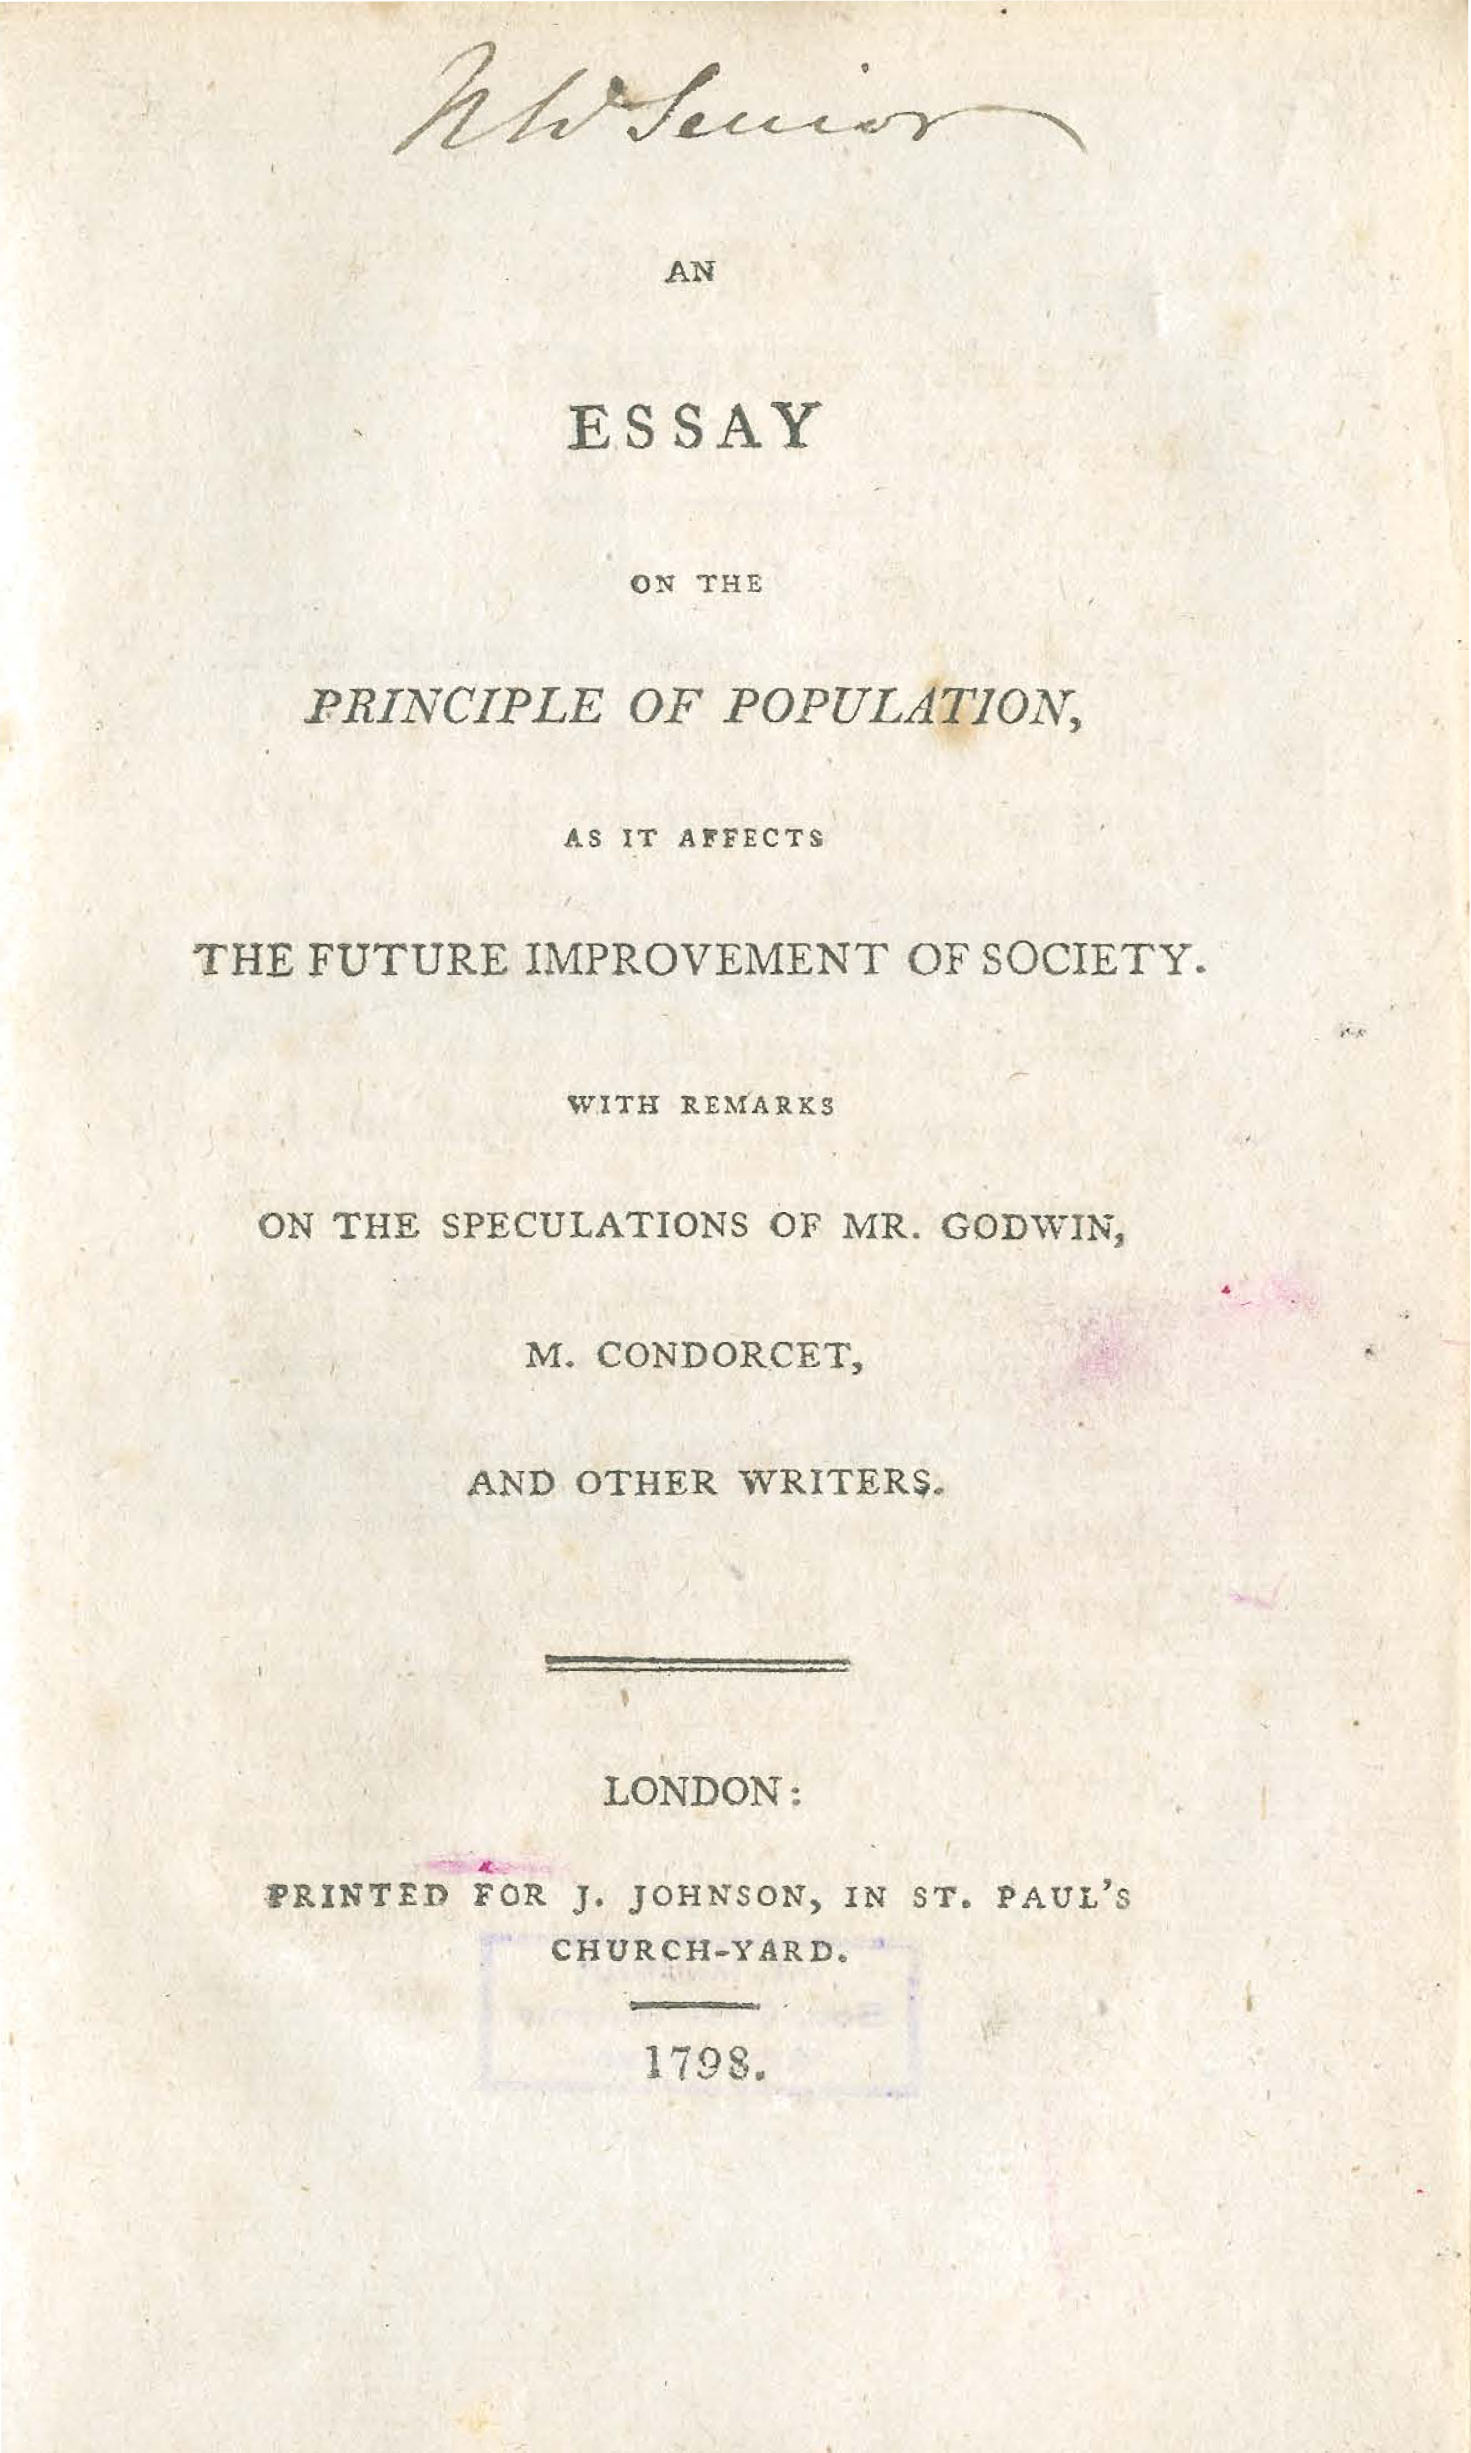 001 Essay On The Principle Of Population Singular Pdf By Thomas Malthus Main Idea Full